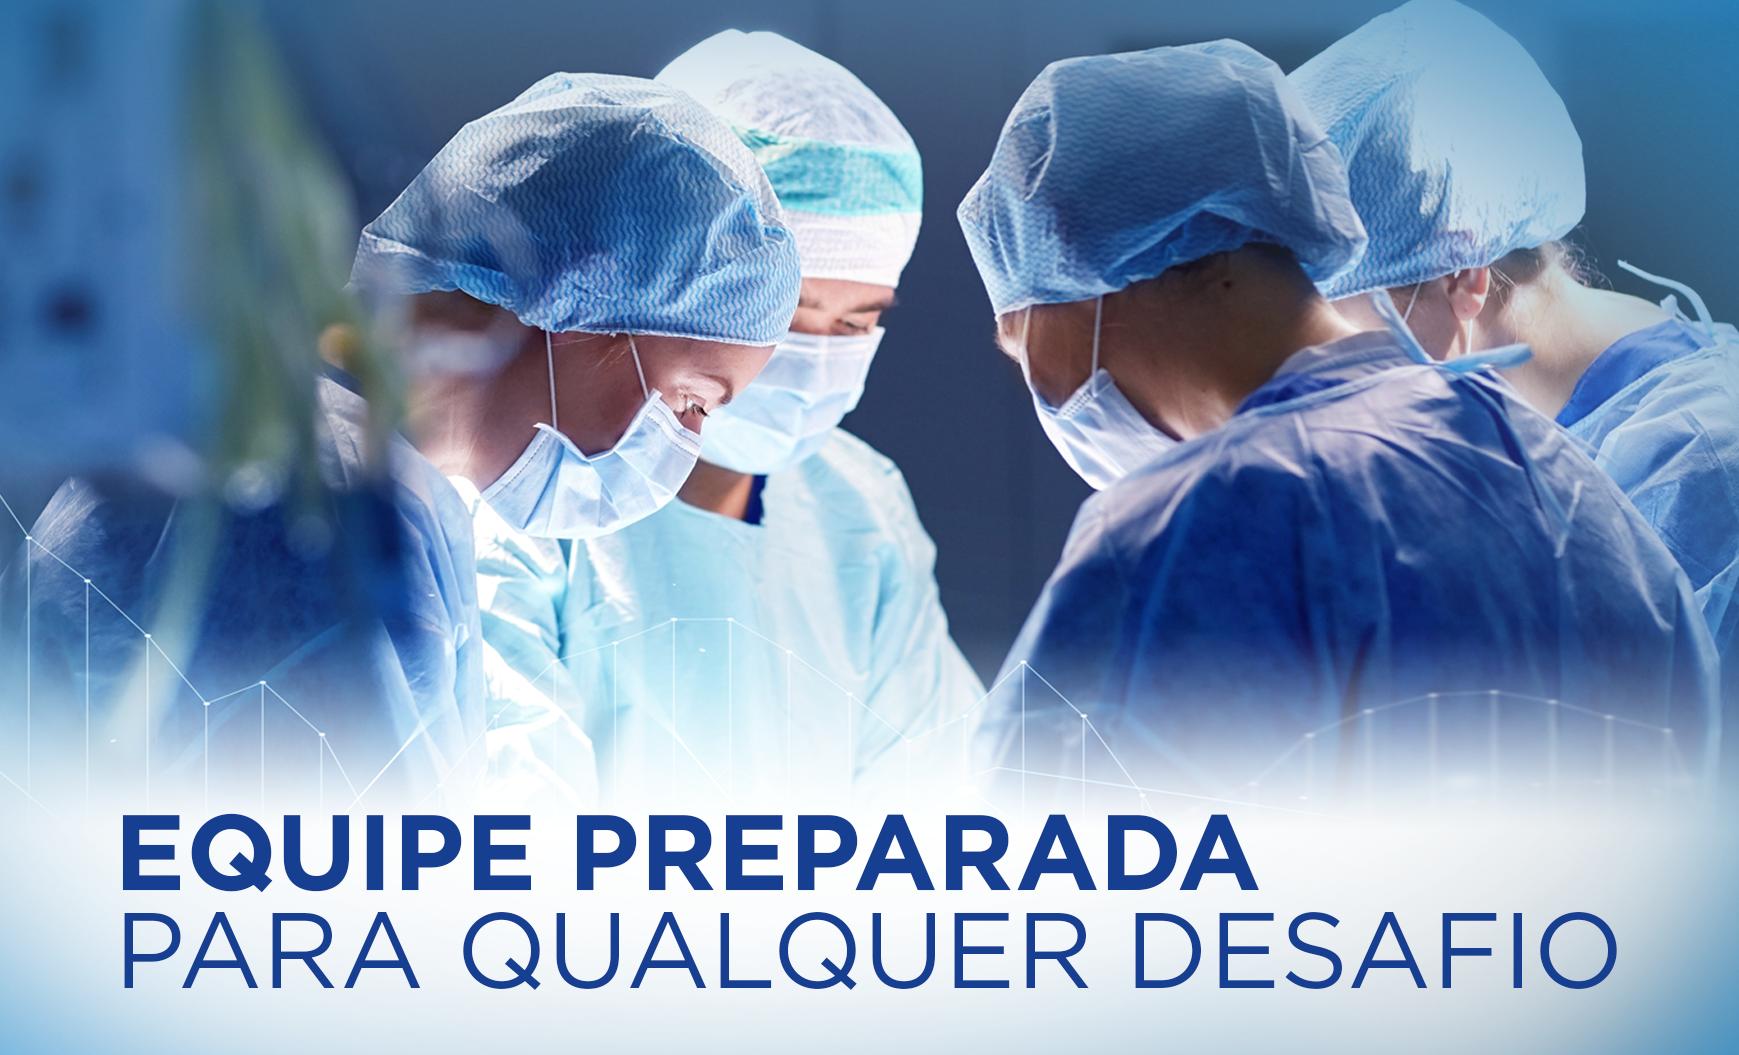 Equipe do Hospital Previna Franco da Rocha realiza procedimento cirúrgico inédito na unidade